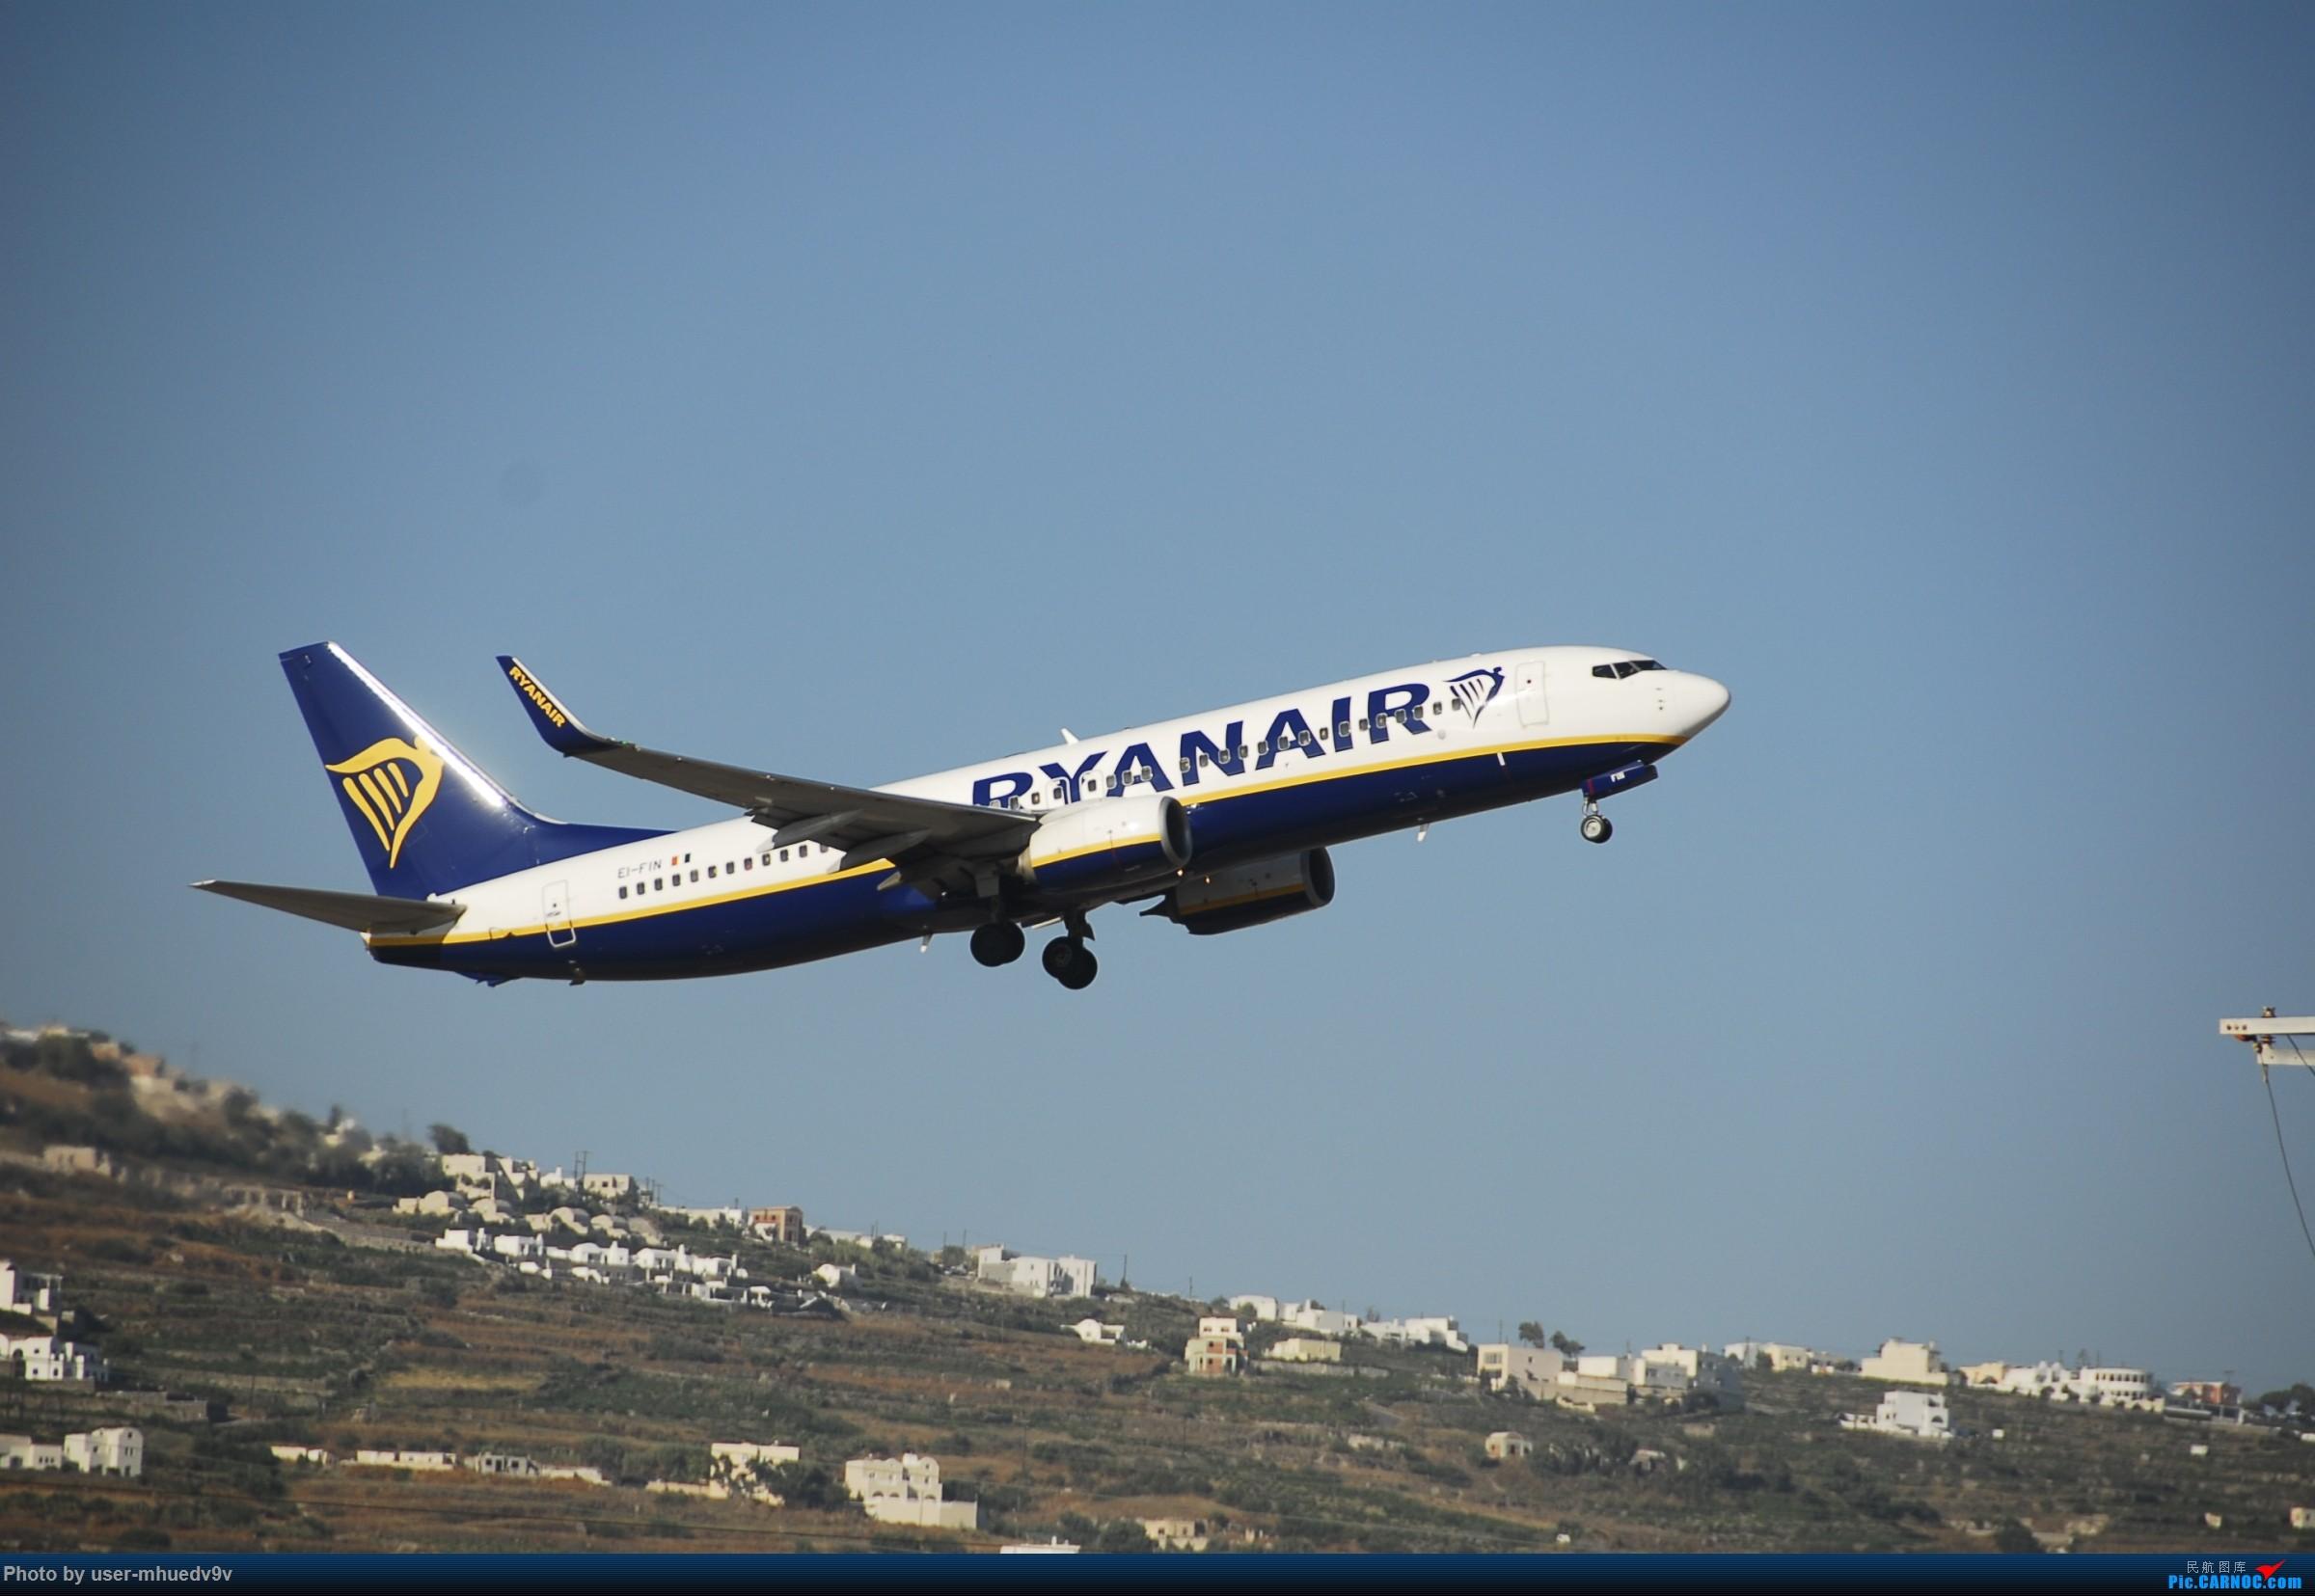 Re:[原创]暑假旅拍(旅途中拍机。。。) BOEING 737-800 EI-FIN 希腊圣托里尼机场